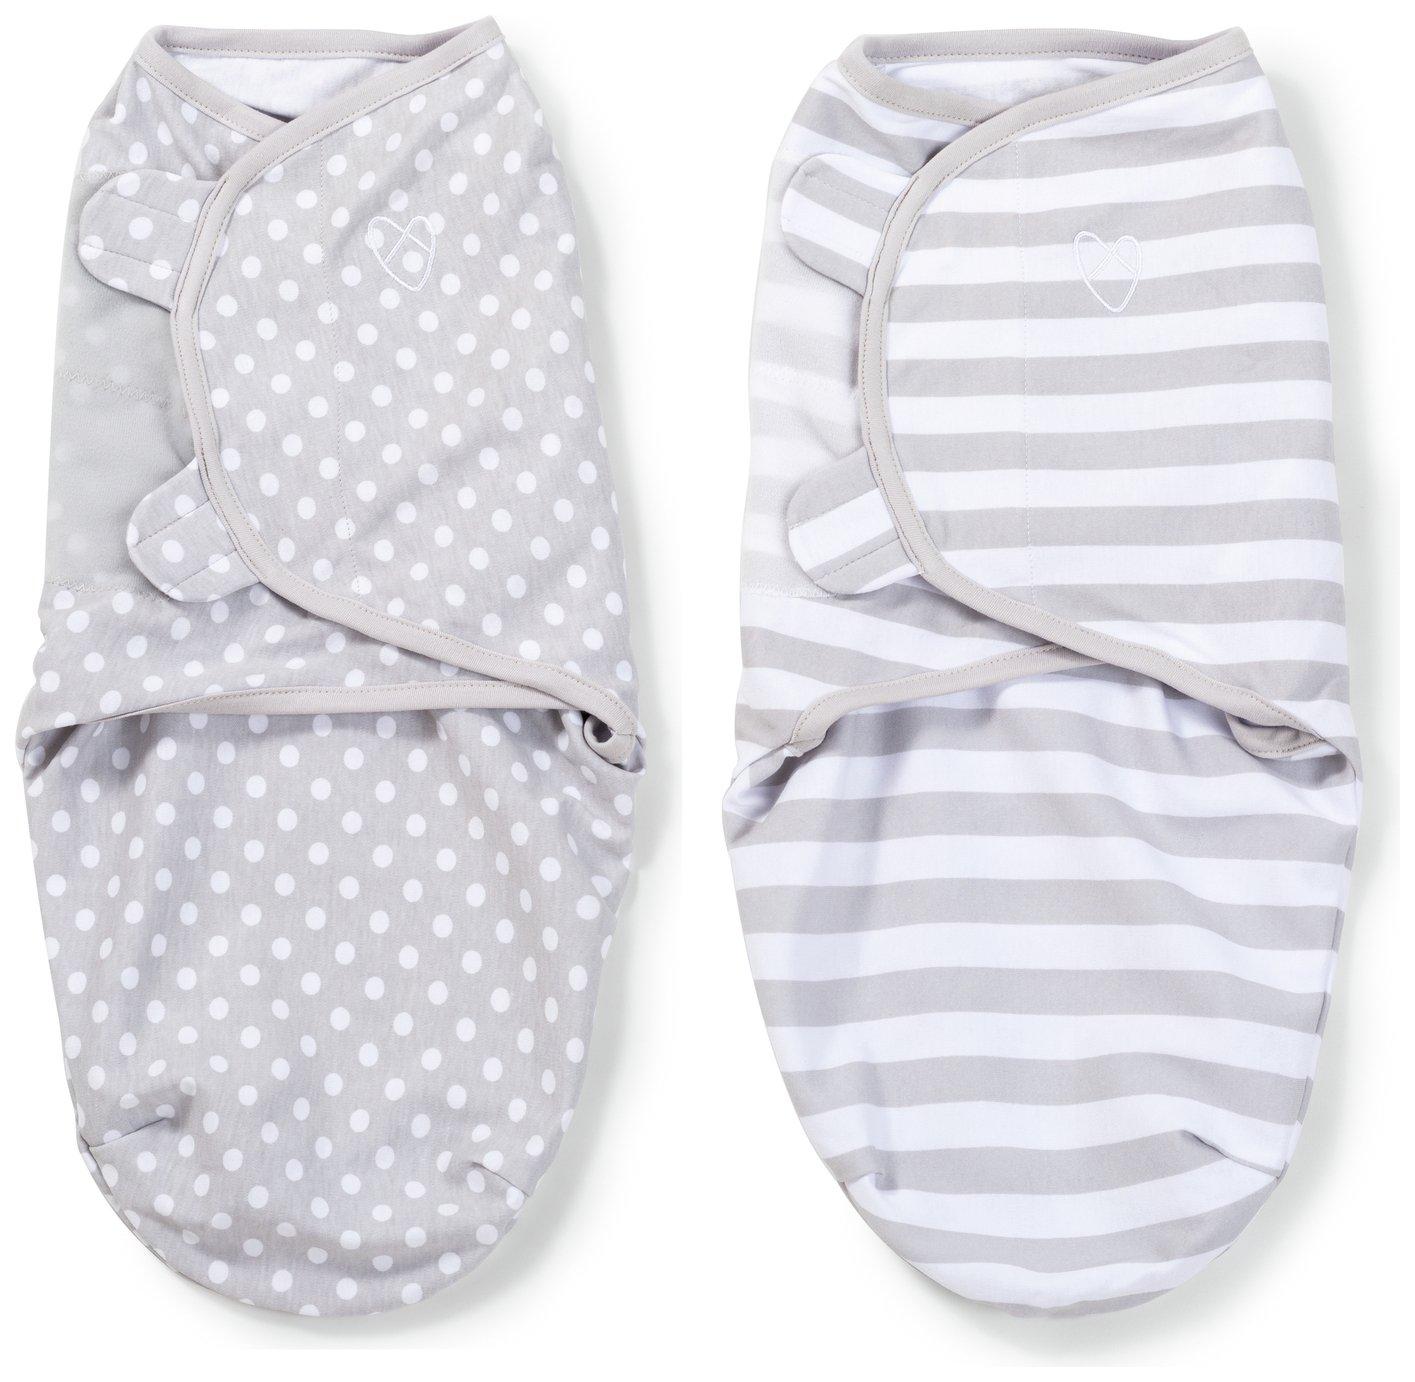 Image of Summer Infant SwaddleMe Grey, Dot & Stripes Swaddle - 2 Pack